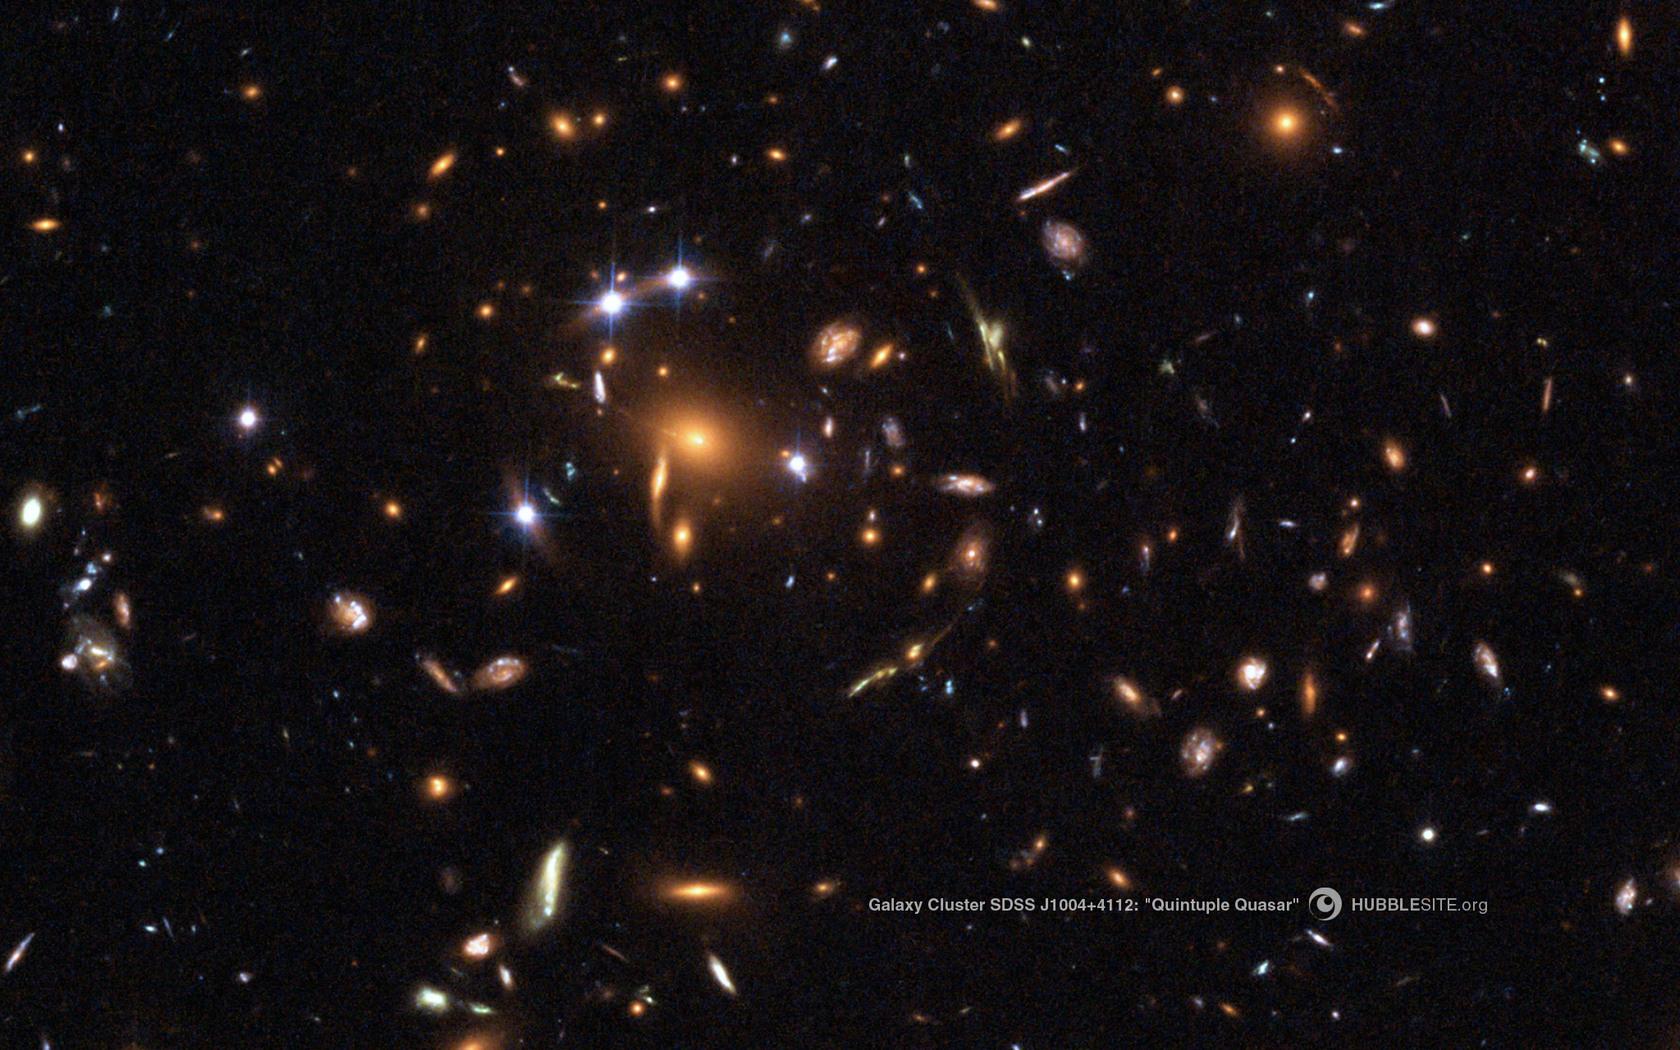 фото квазаров